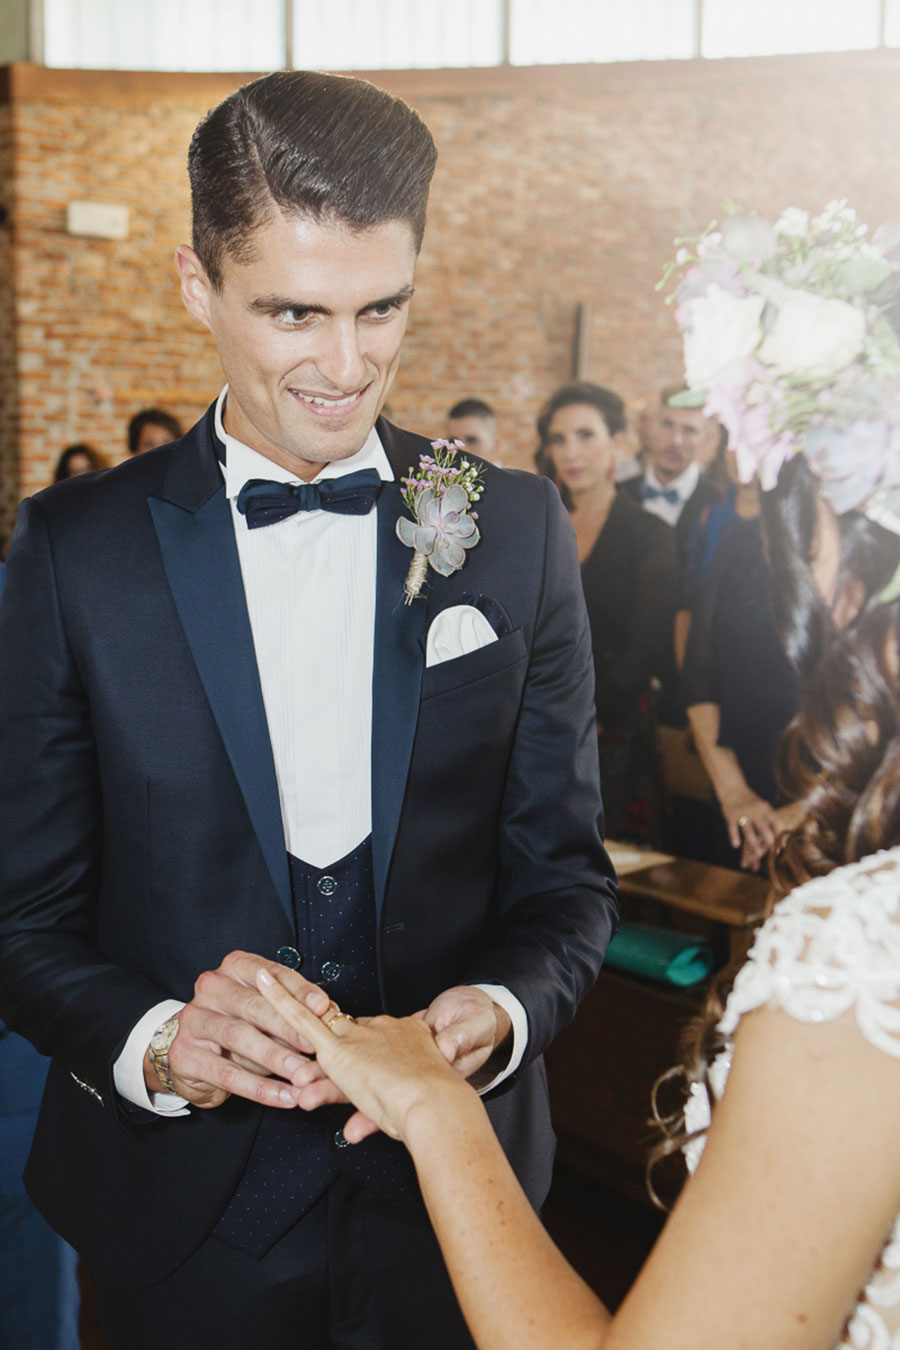 Wedding-Nicholad-and-Federica-Giuseppe-Giovannelli-130